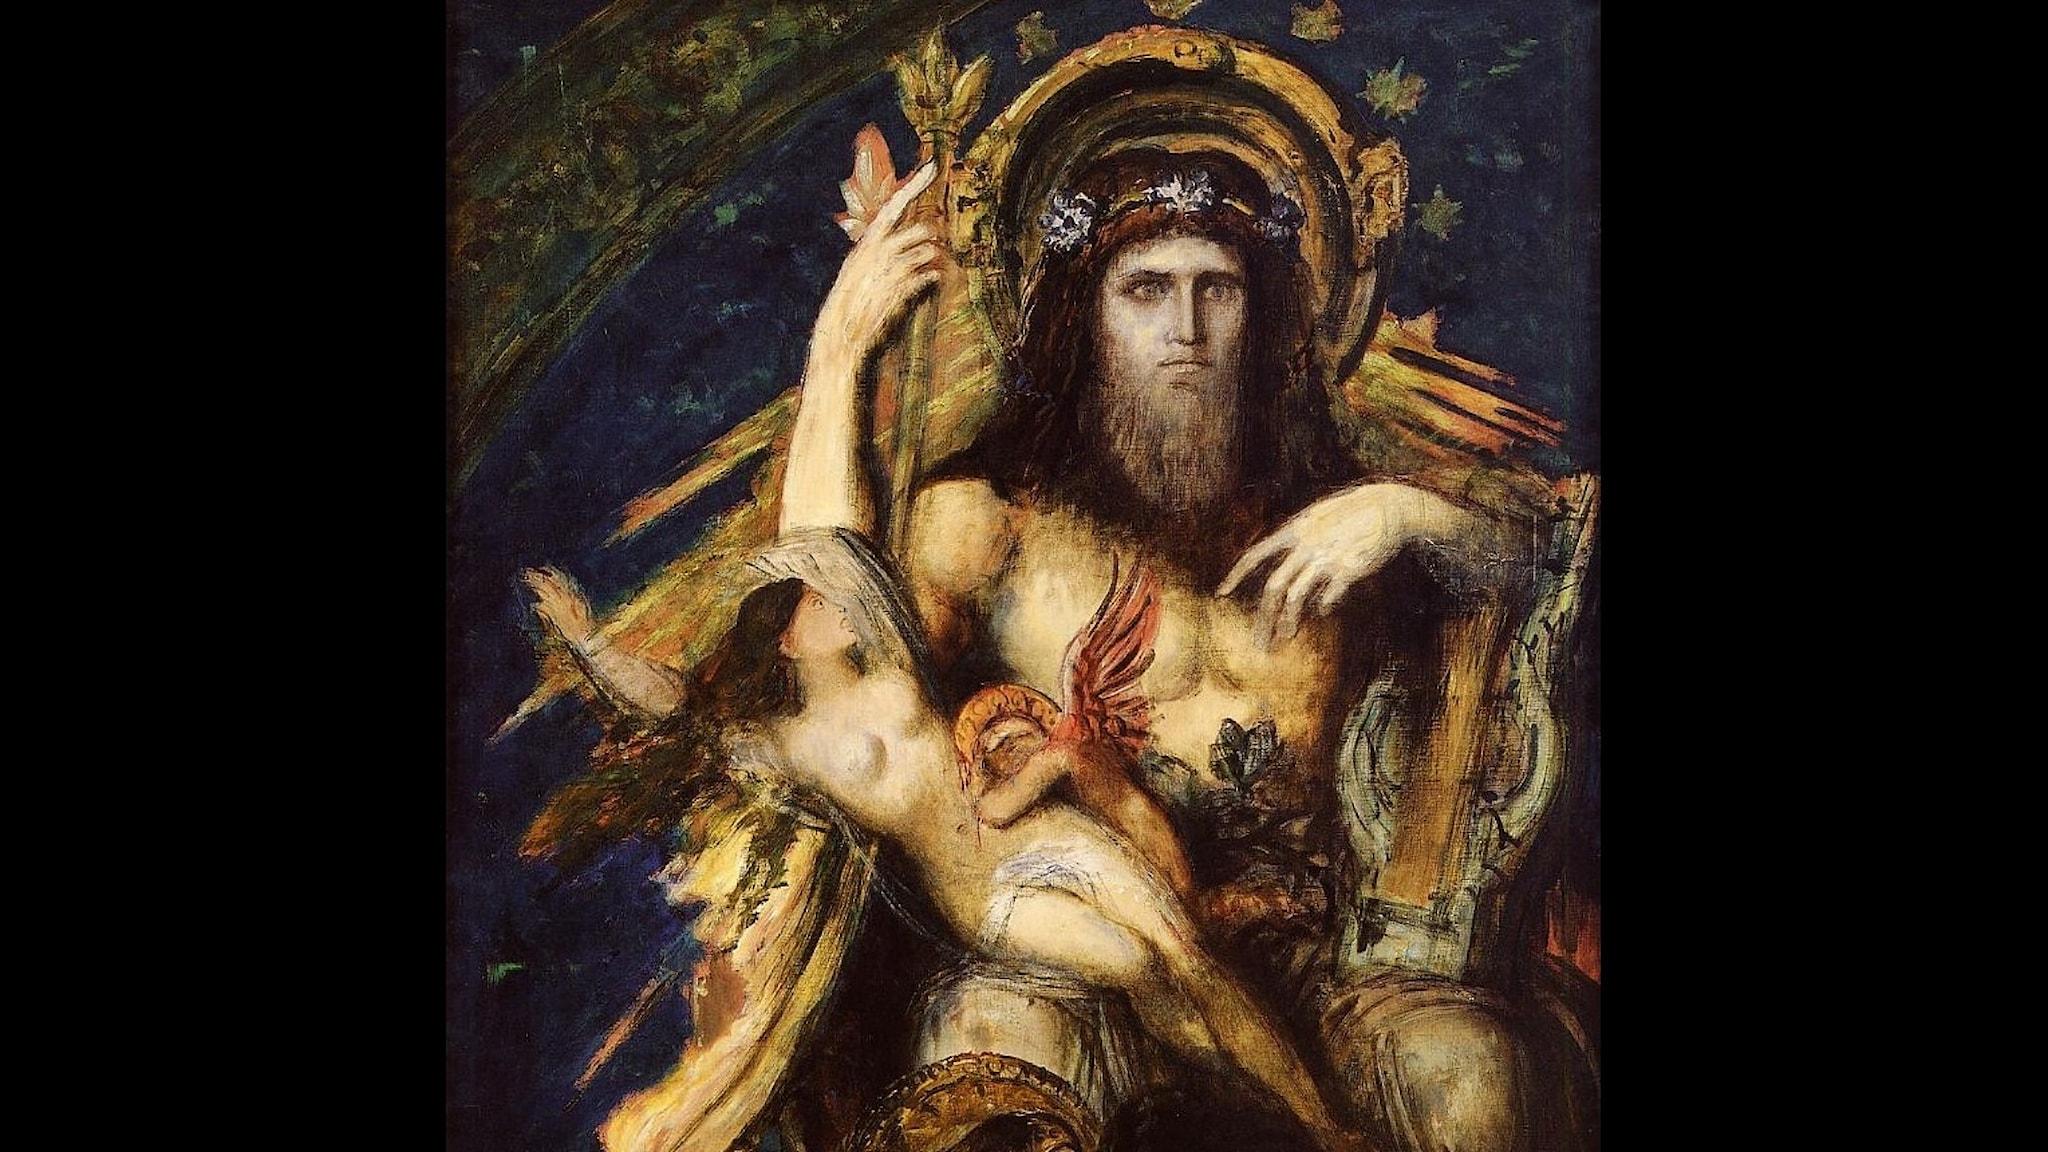 Jupiter och Semele. Gustave Moreau. 1895. Wikiart.